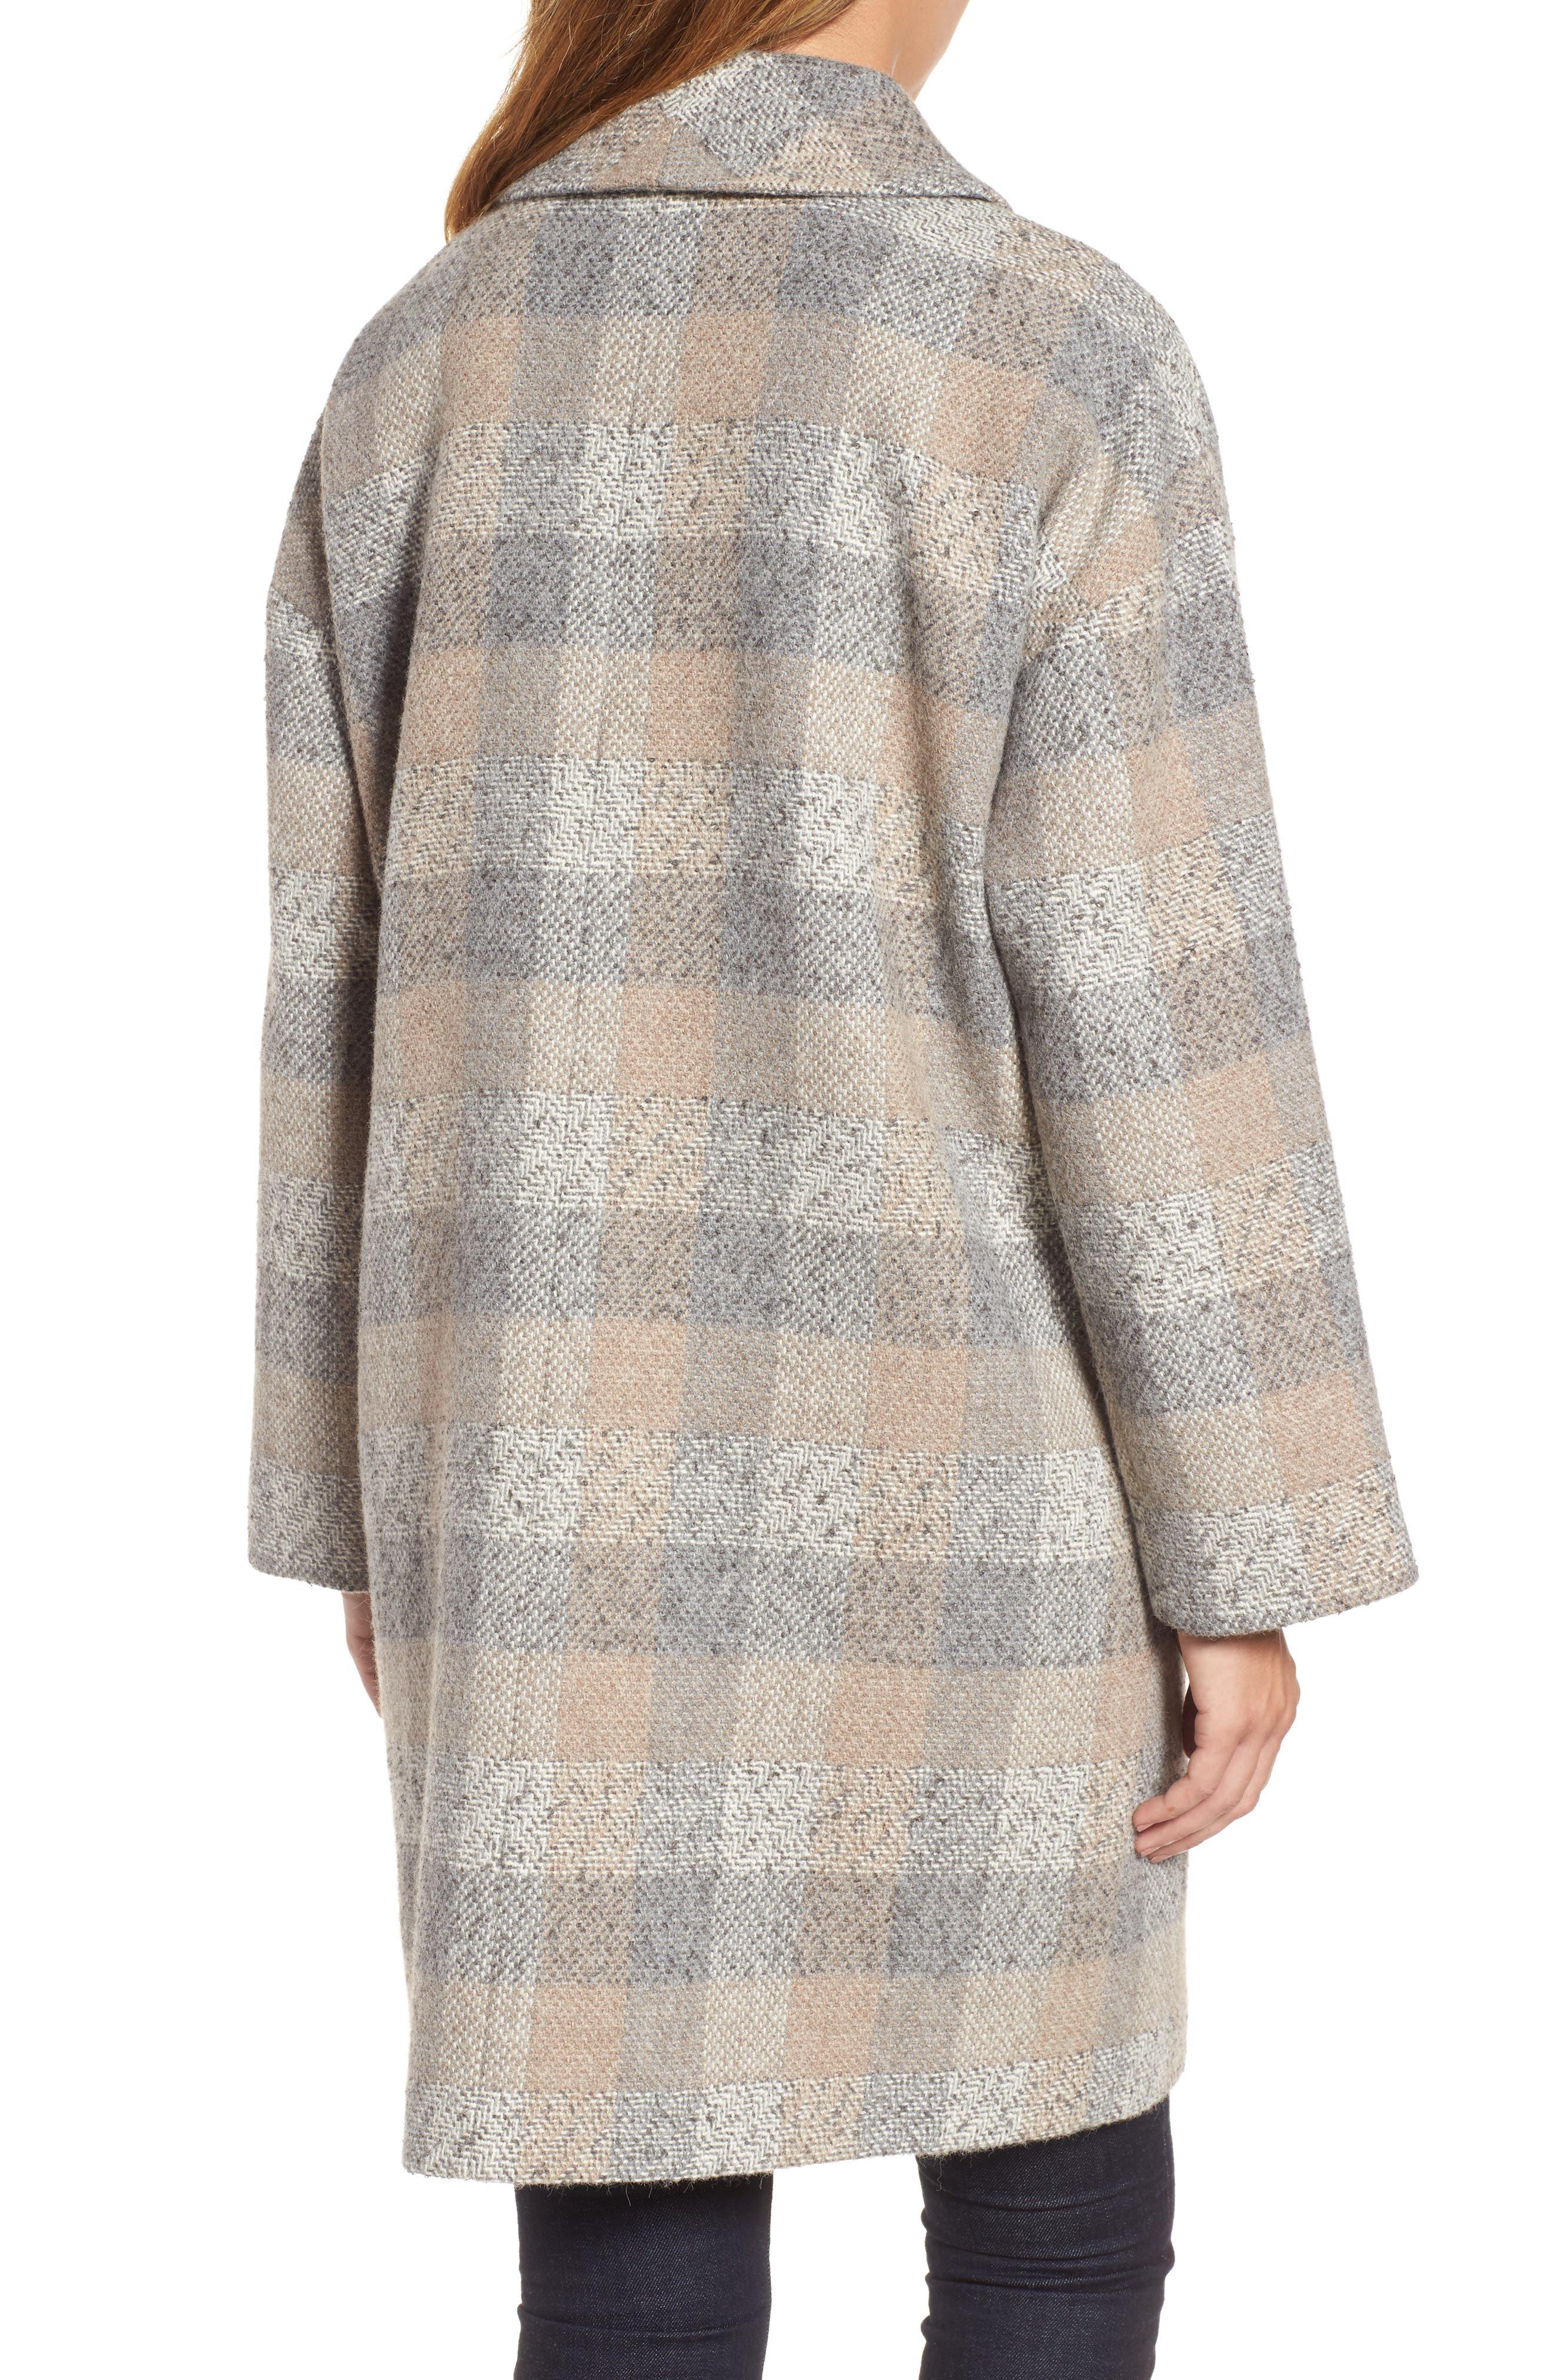 Plaid Alpaca Blend Coat,                             Alternate thumbnail 2, color,